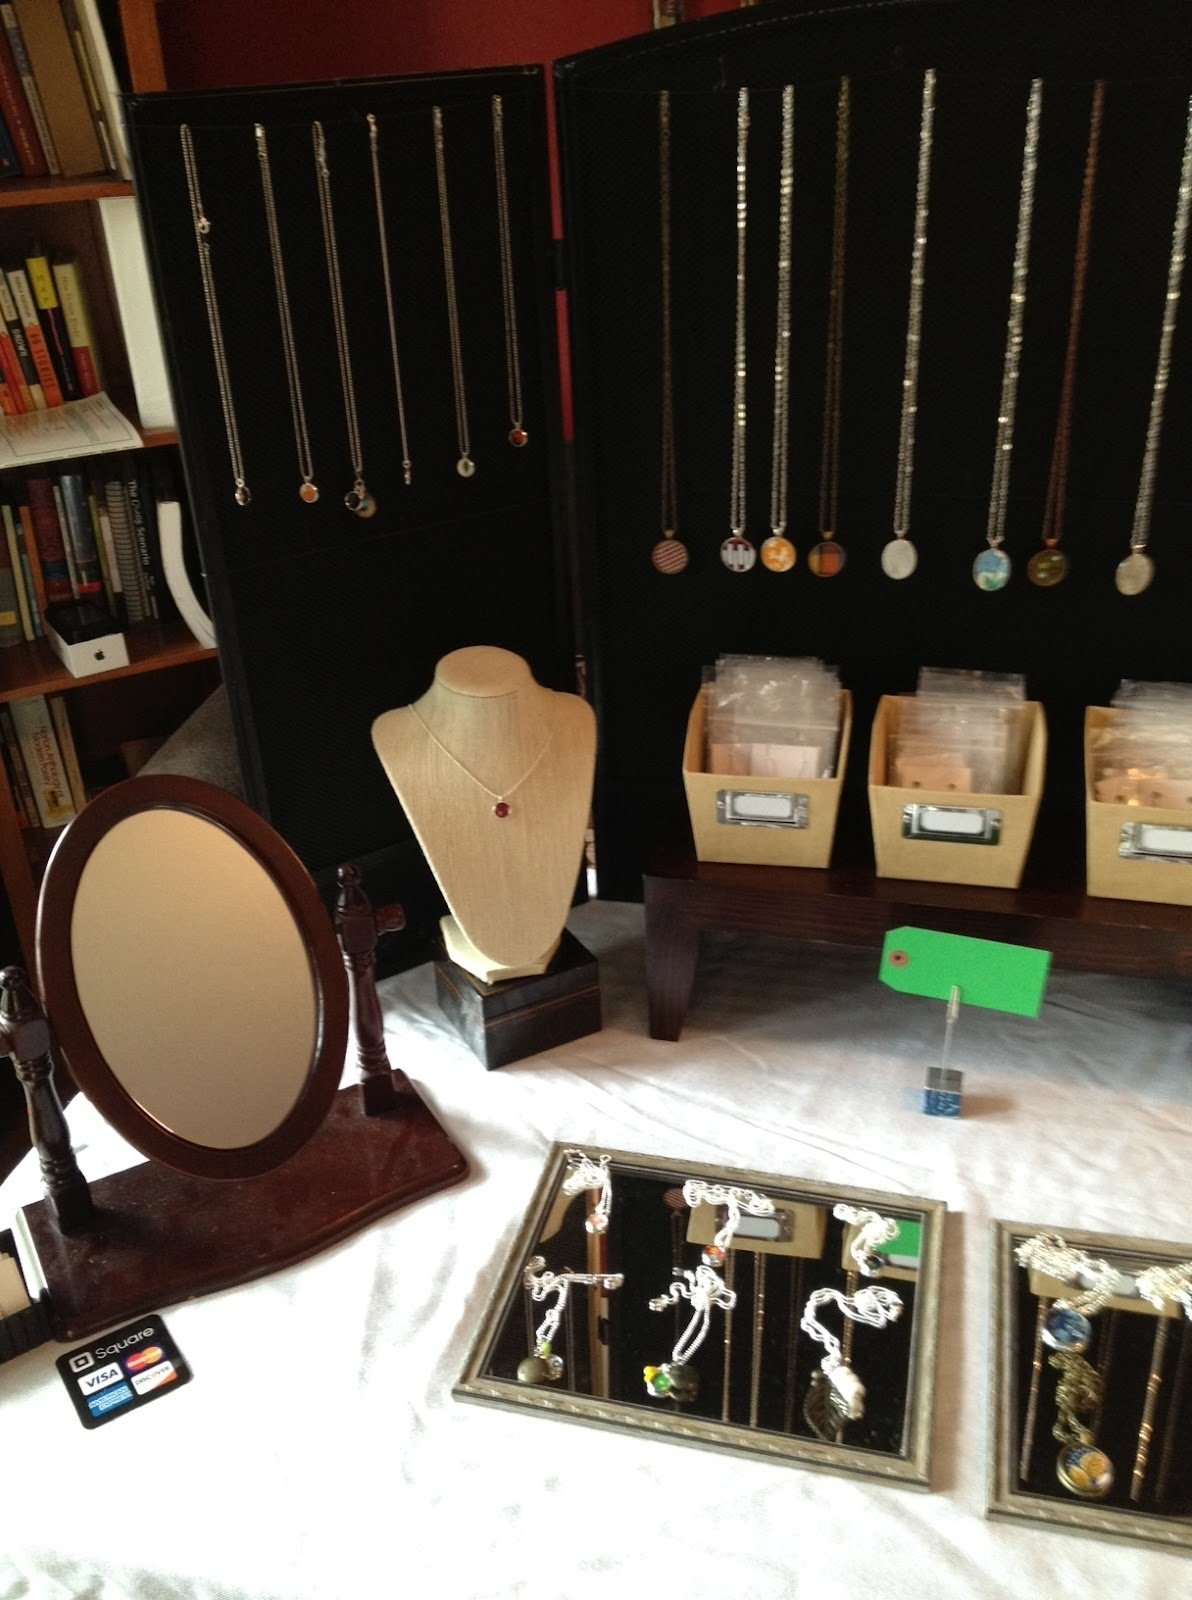 10 Perfect Craft Show Jewelry Display Ideas